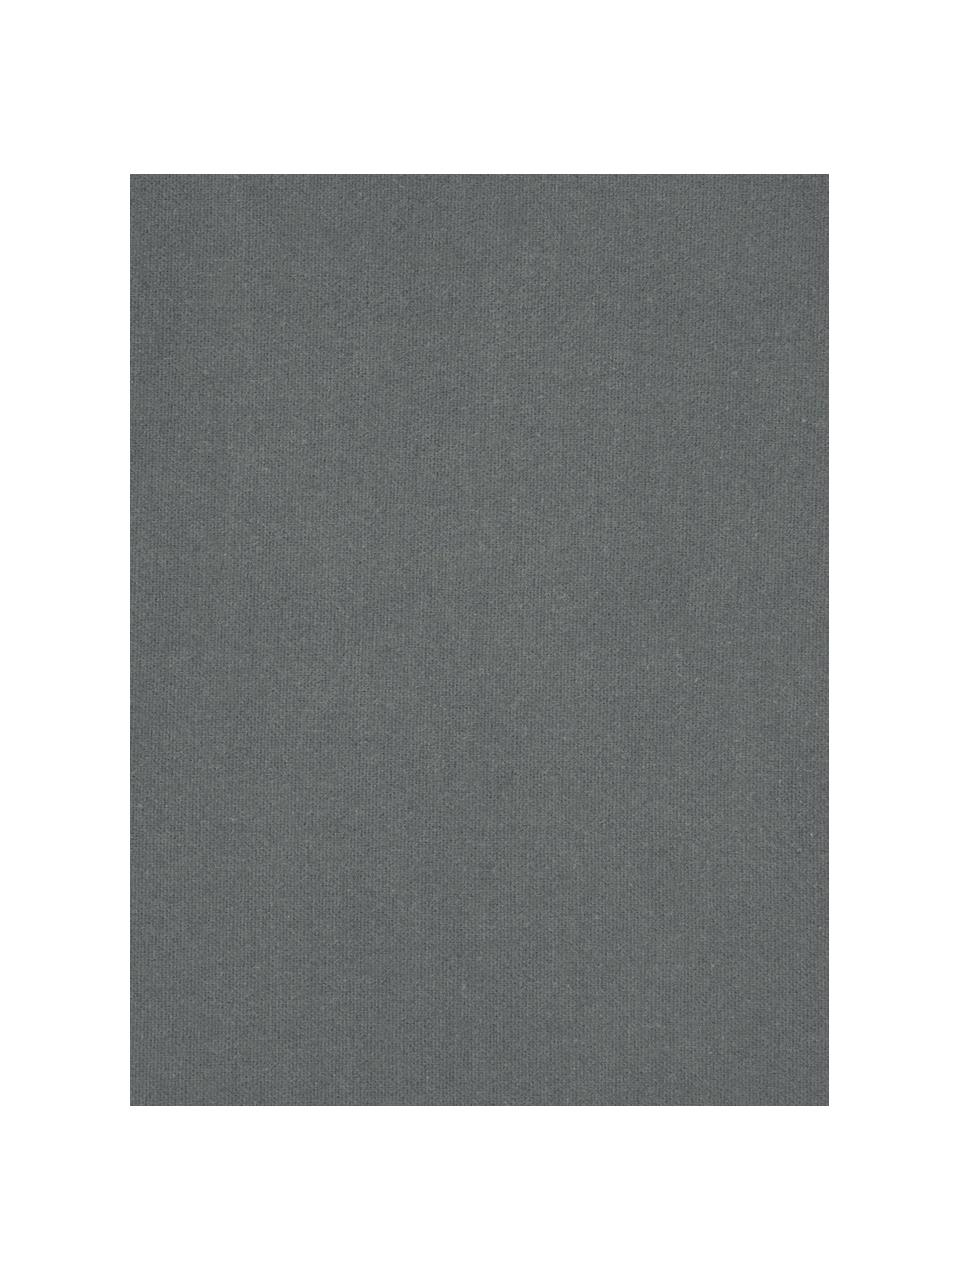 Flanell-Spannbettlaken Biba in Grau, Webart: Flanell Flanell ist ein k, Grau, 180 x 200 cm